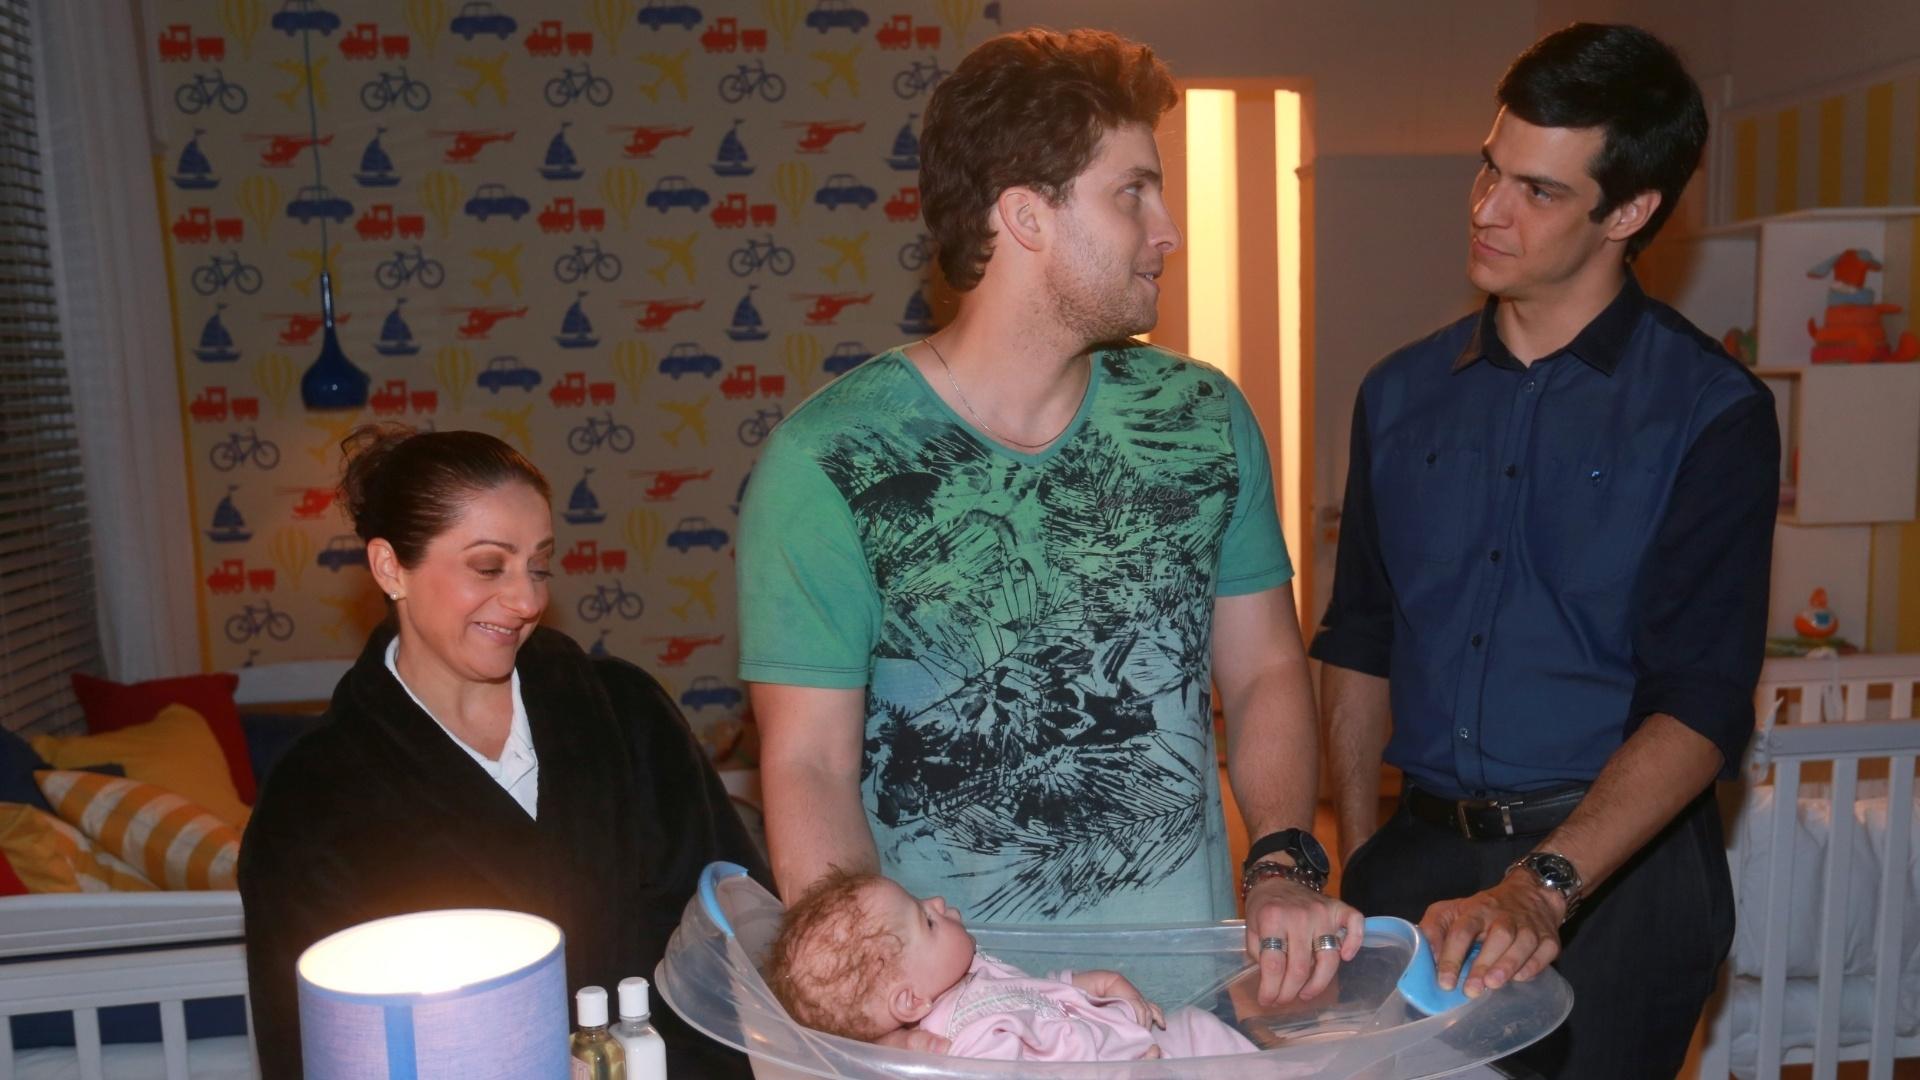 7.jan.2014 - Josie Antello, Thiago Fragoso e Mateus Solano ensaiam cena de banho em boneco que representa o bebê Fabrício, de